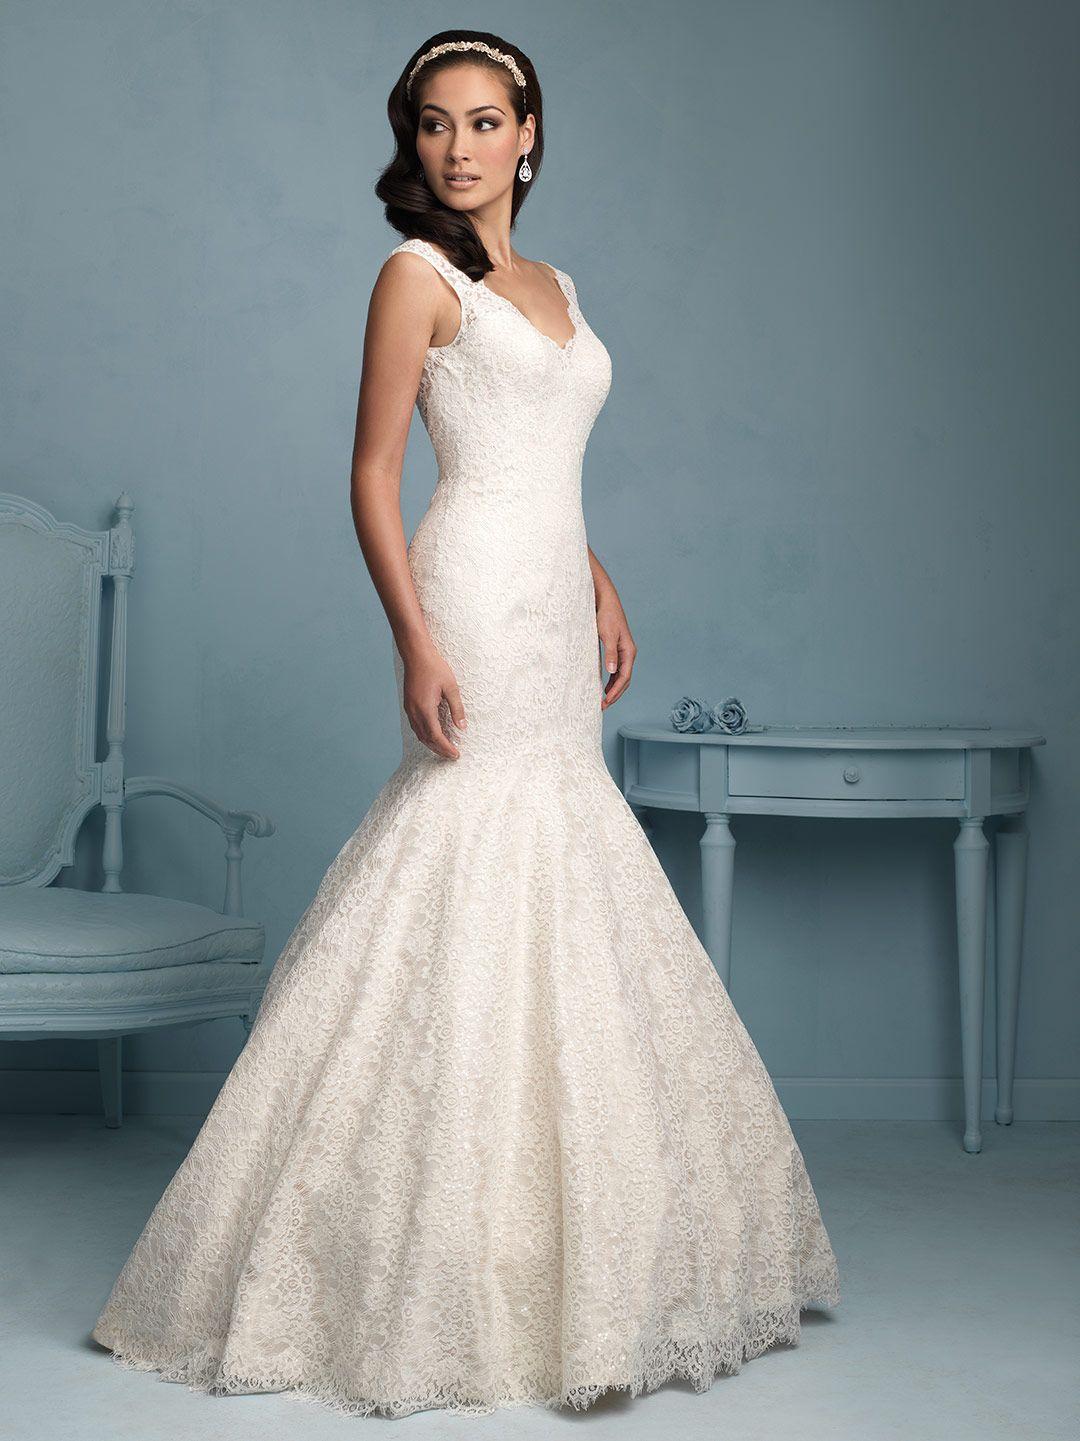 Allure bridals a song pinterest wedding dress simple